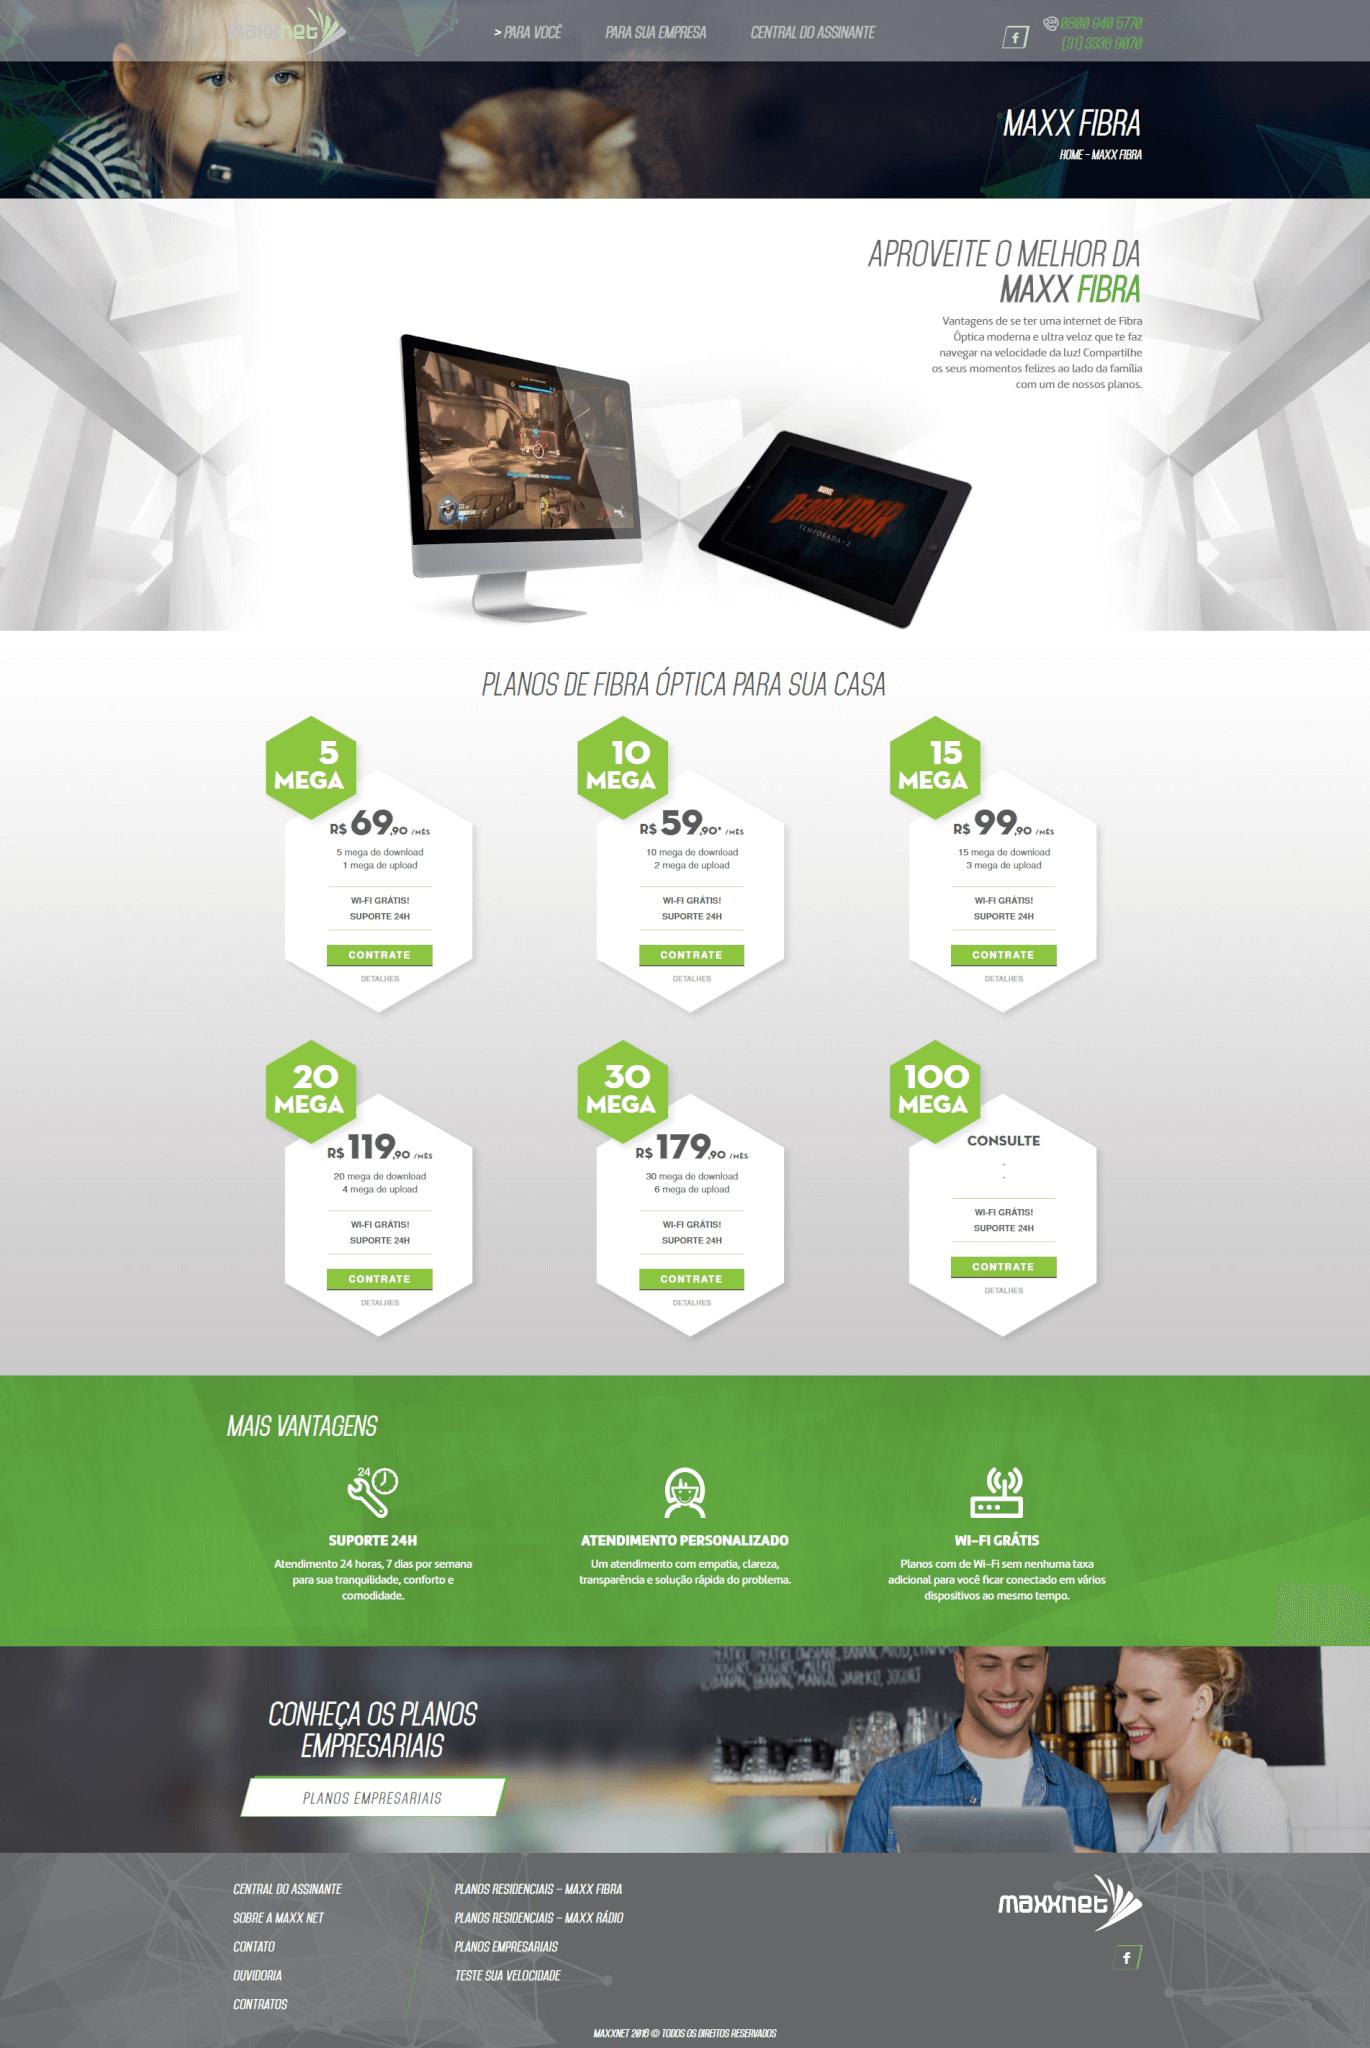 Página Maxx Fibra Maxx Net